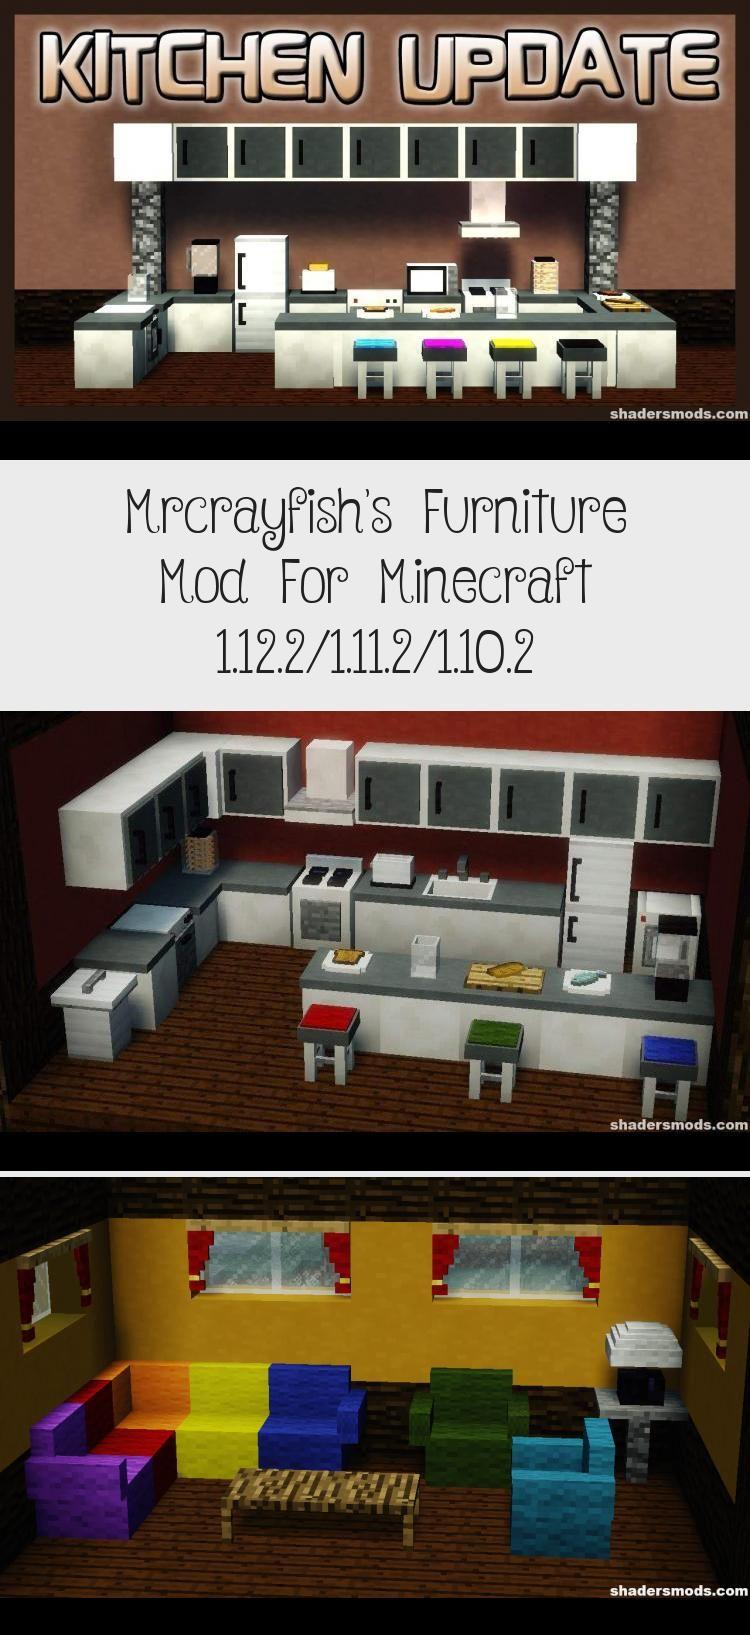 Mrcrayfish Furniture Mod 1.12 2